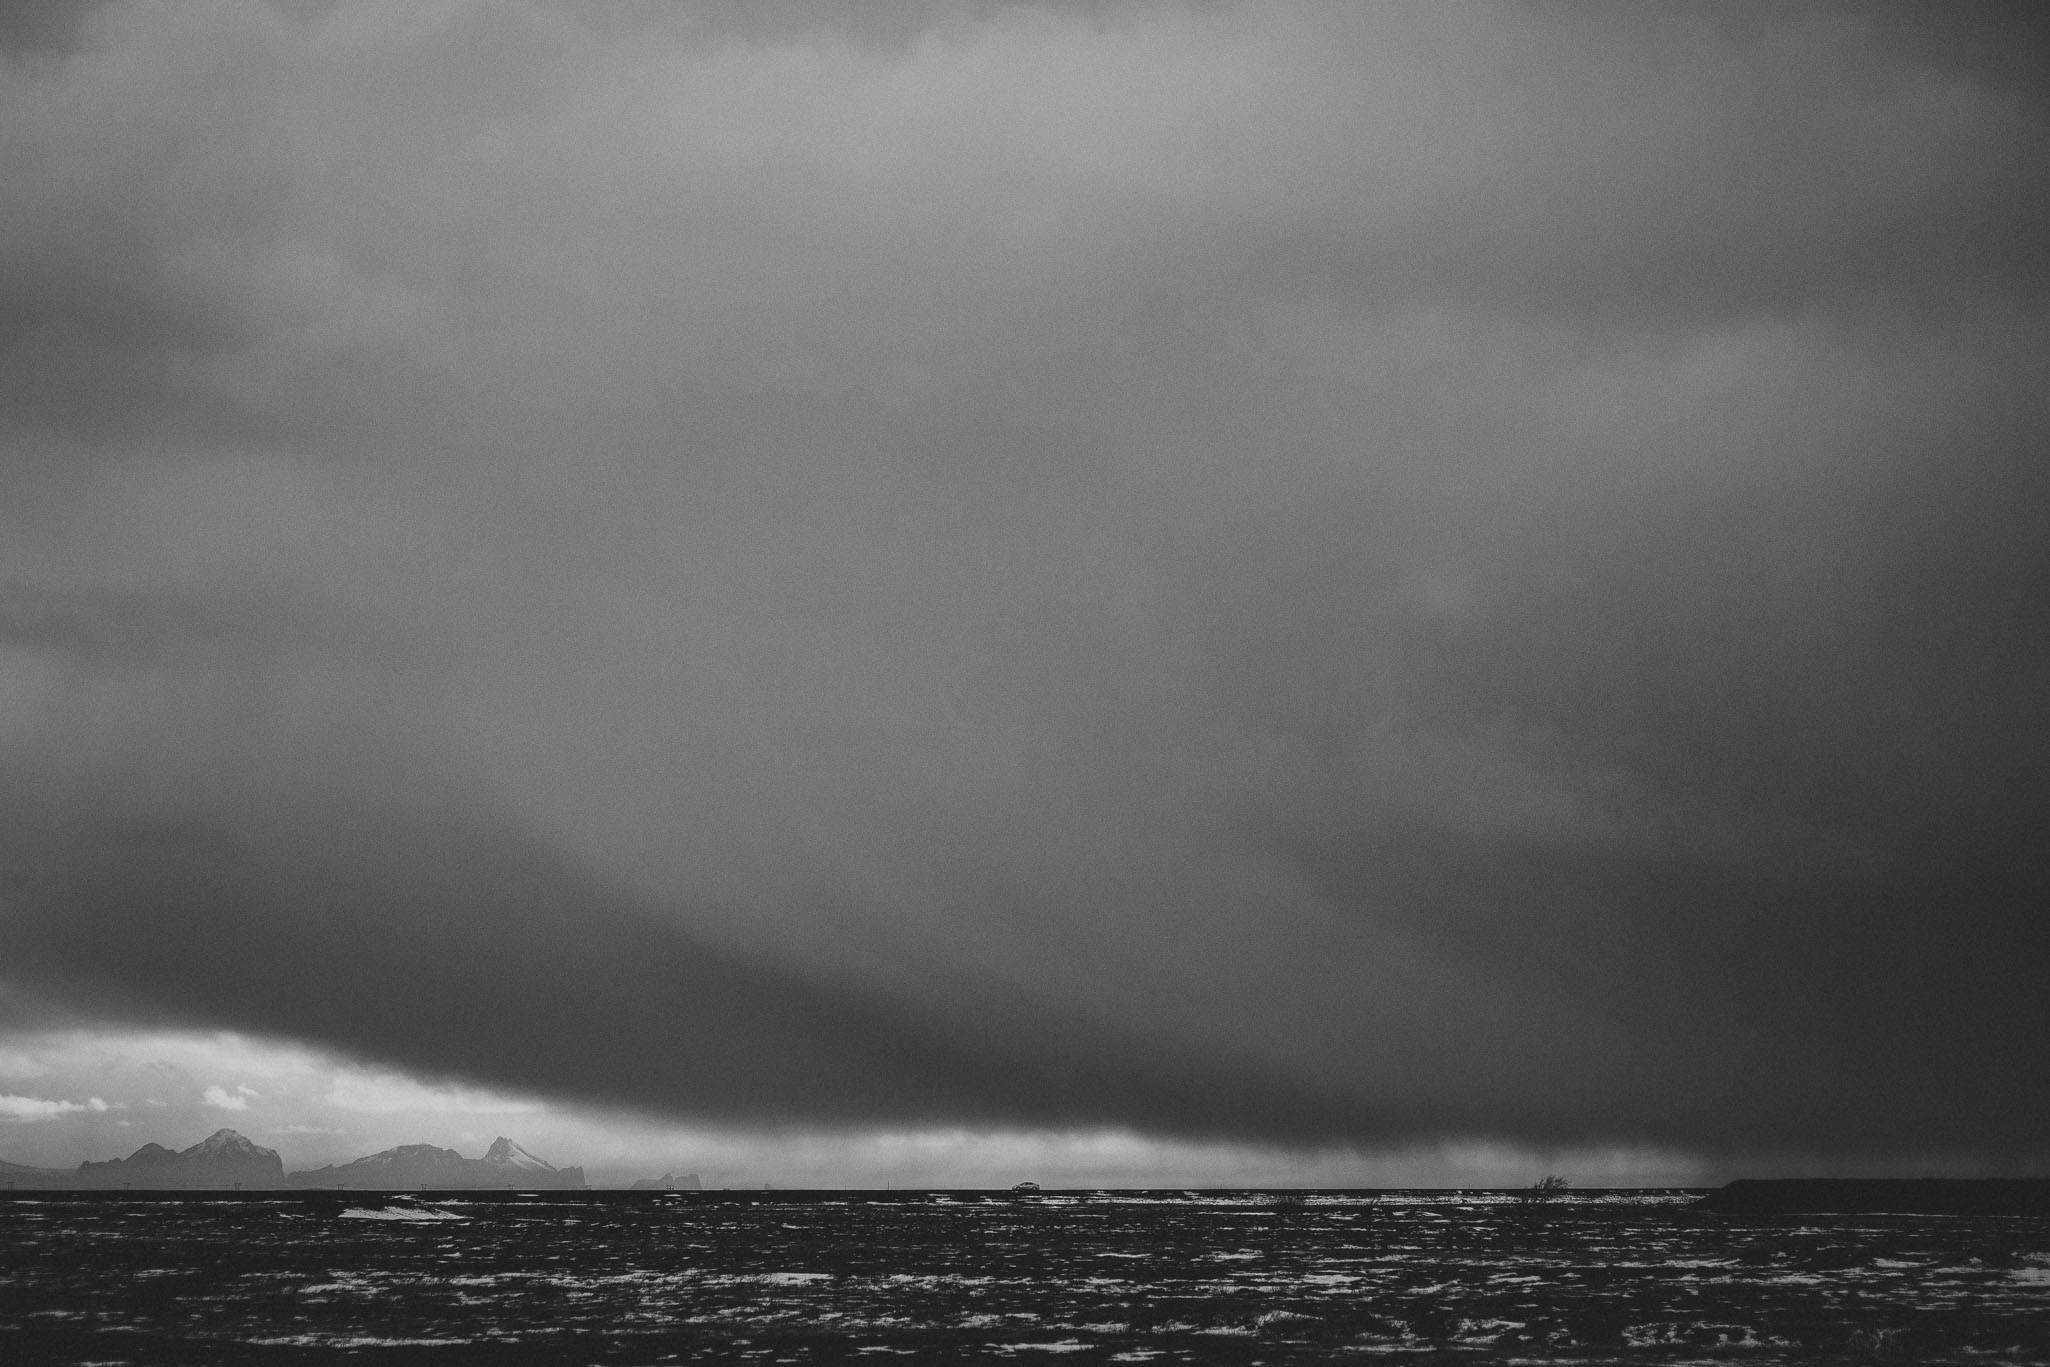 Road-trip-Islande-Iceland-Voyage-Travel-Portrait-Jérémy-Boyer-Cascade-waterfall-foss-Seljalandsfoss-3.jpg